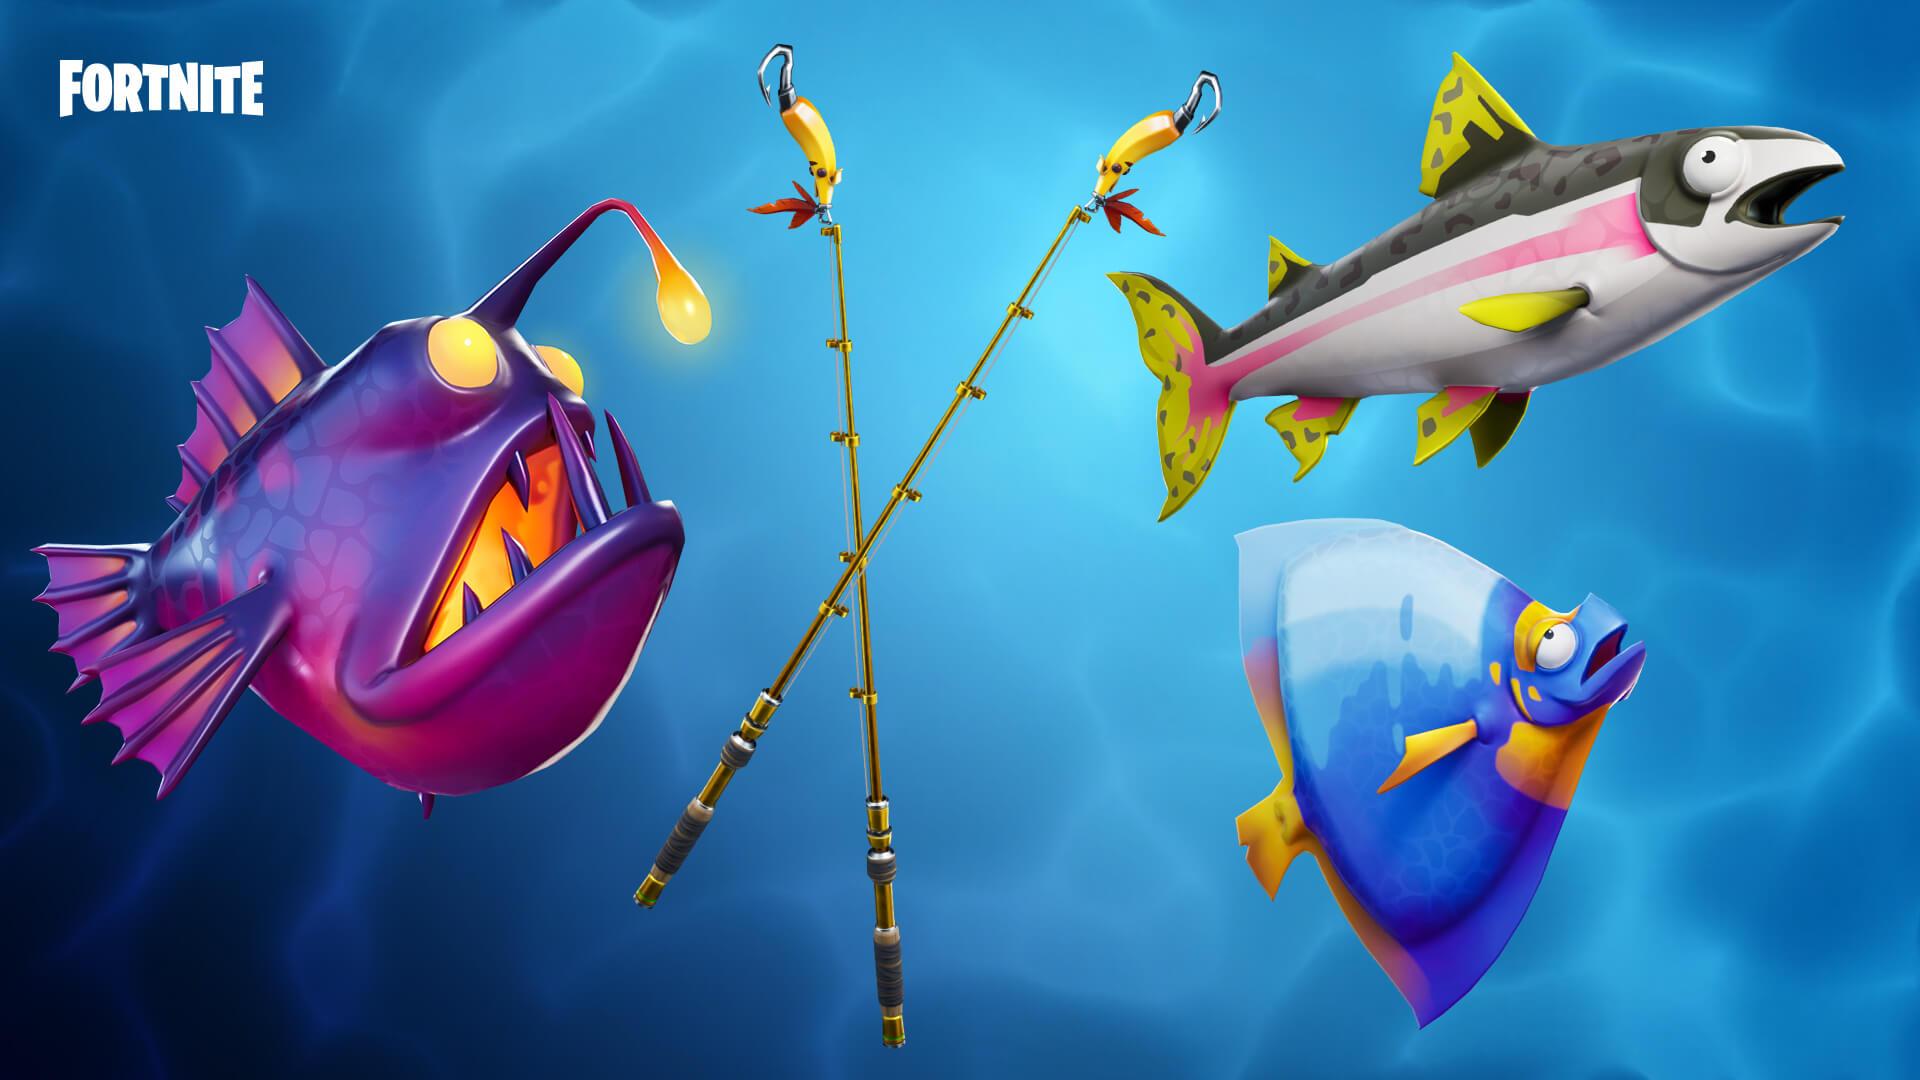 Fortnite Fish